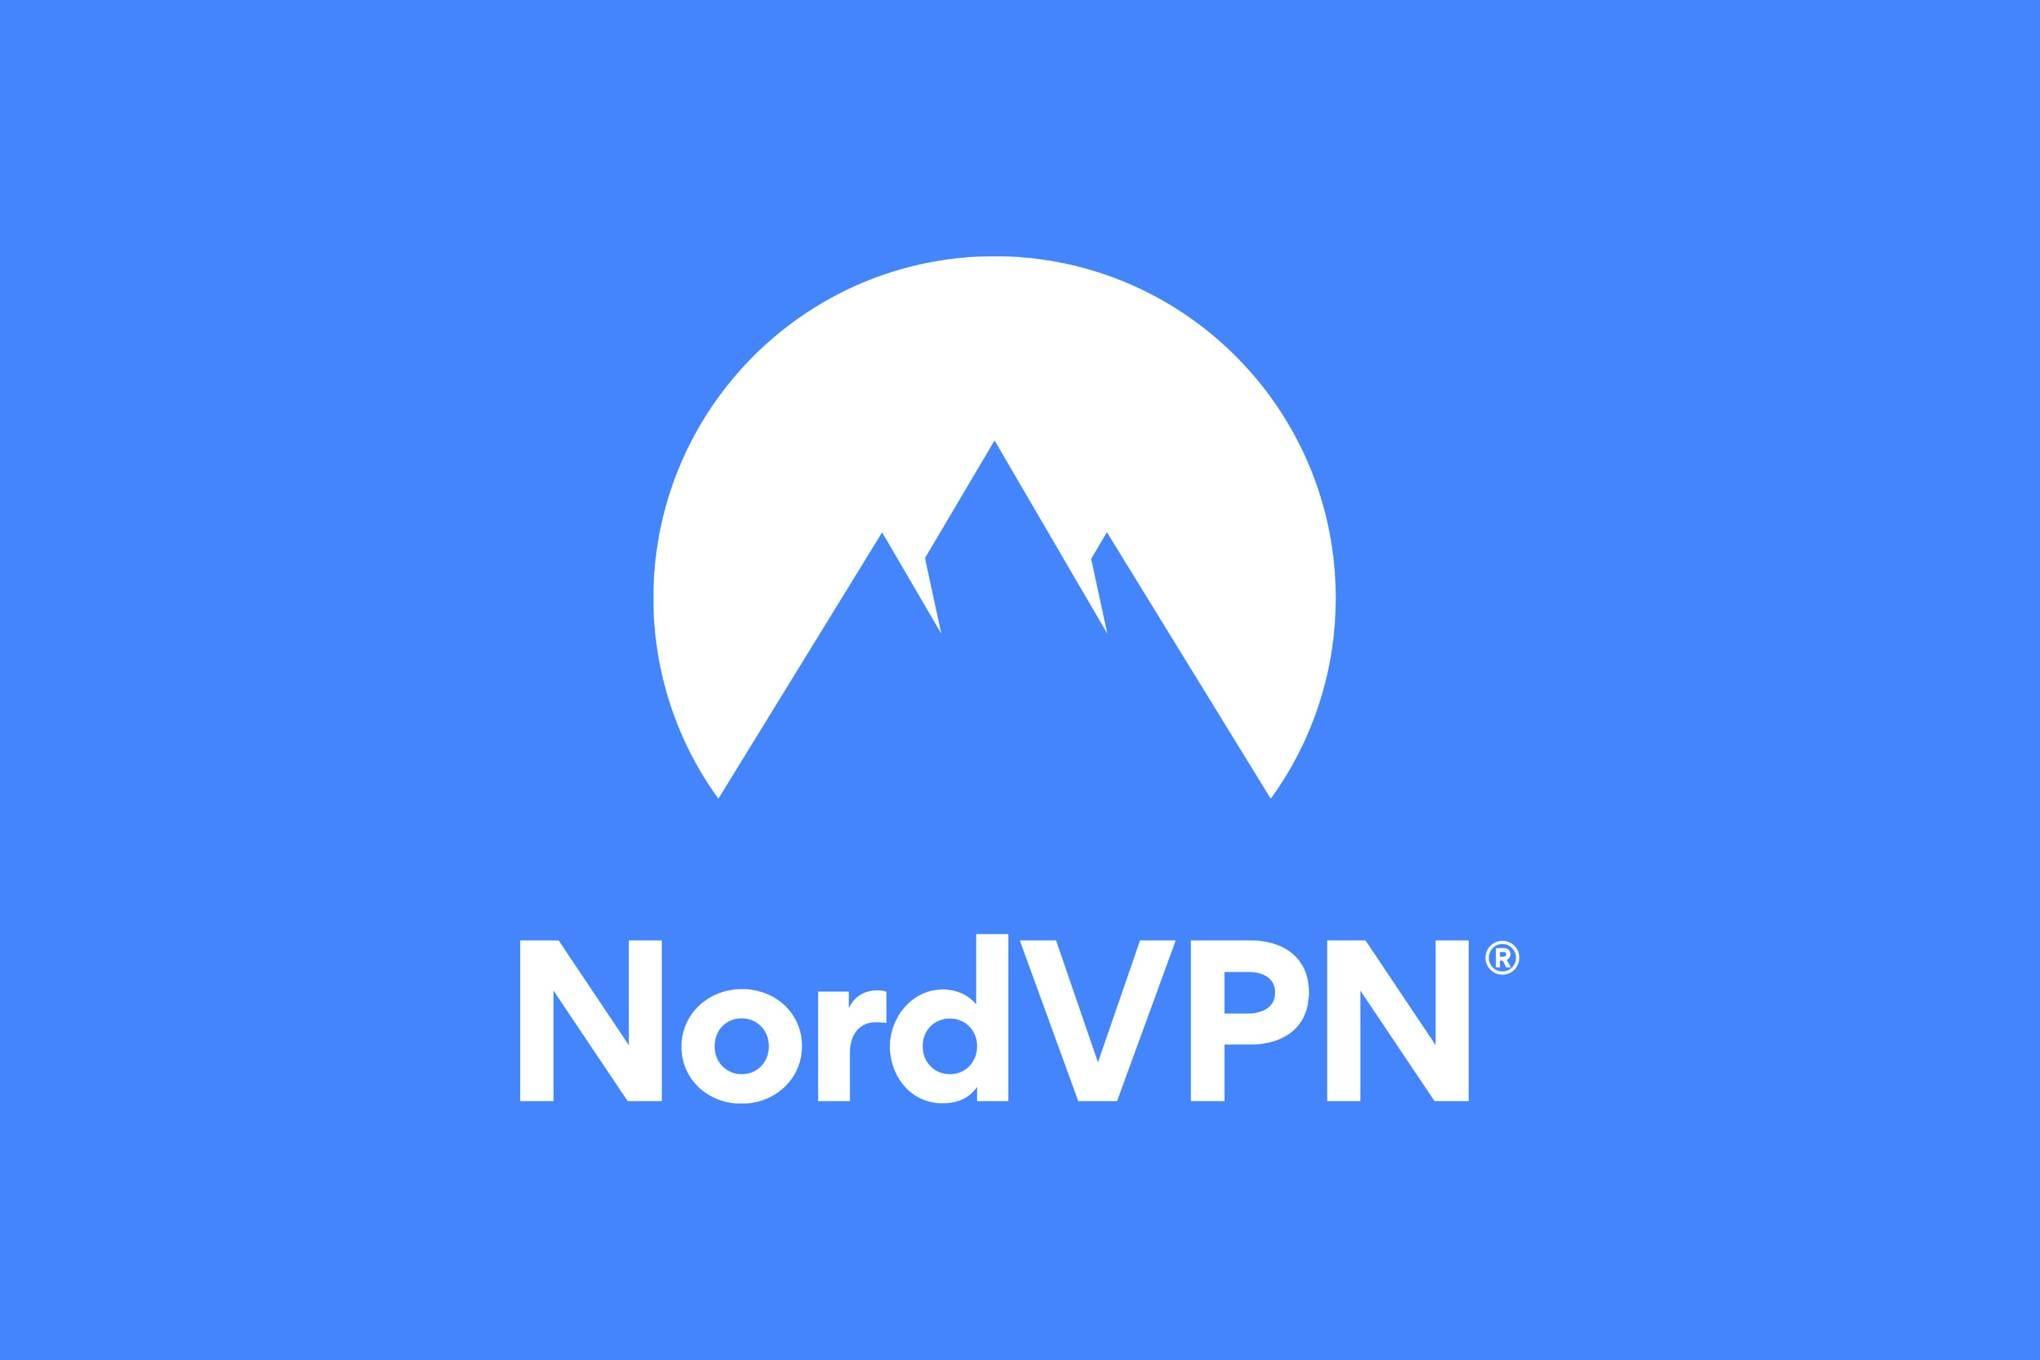 wired-nordvpn-2